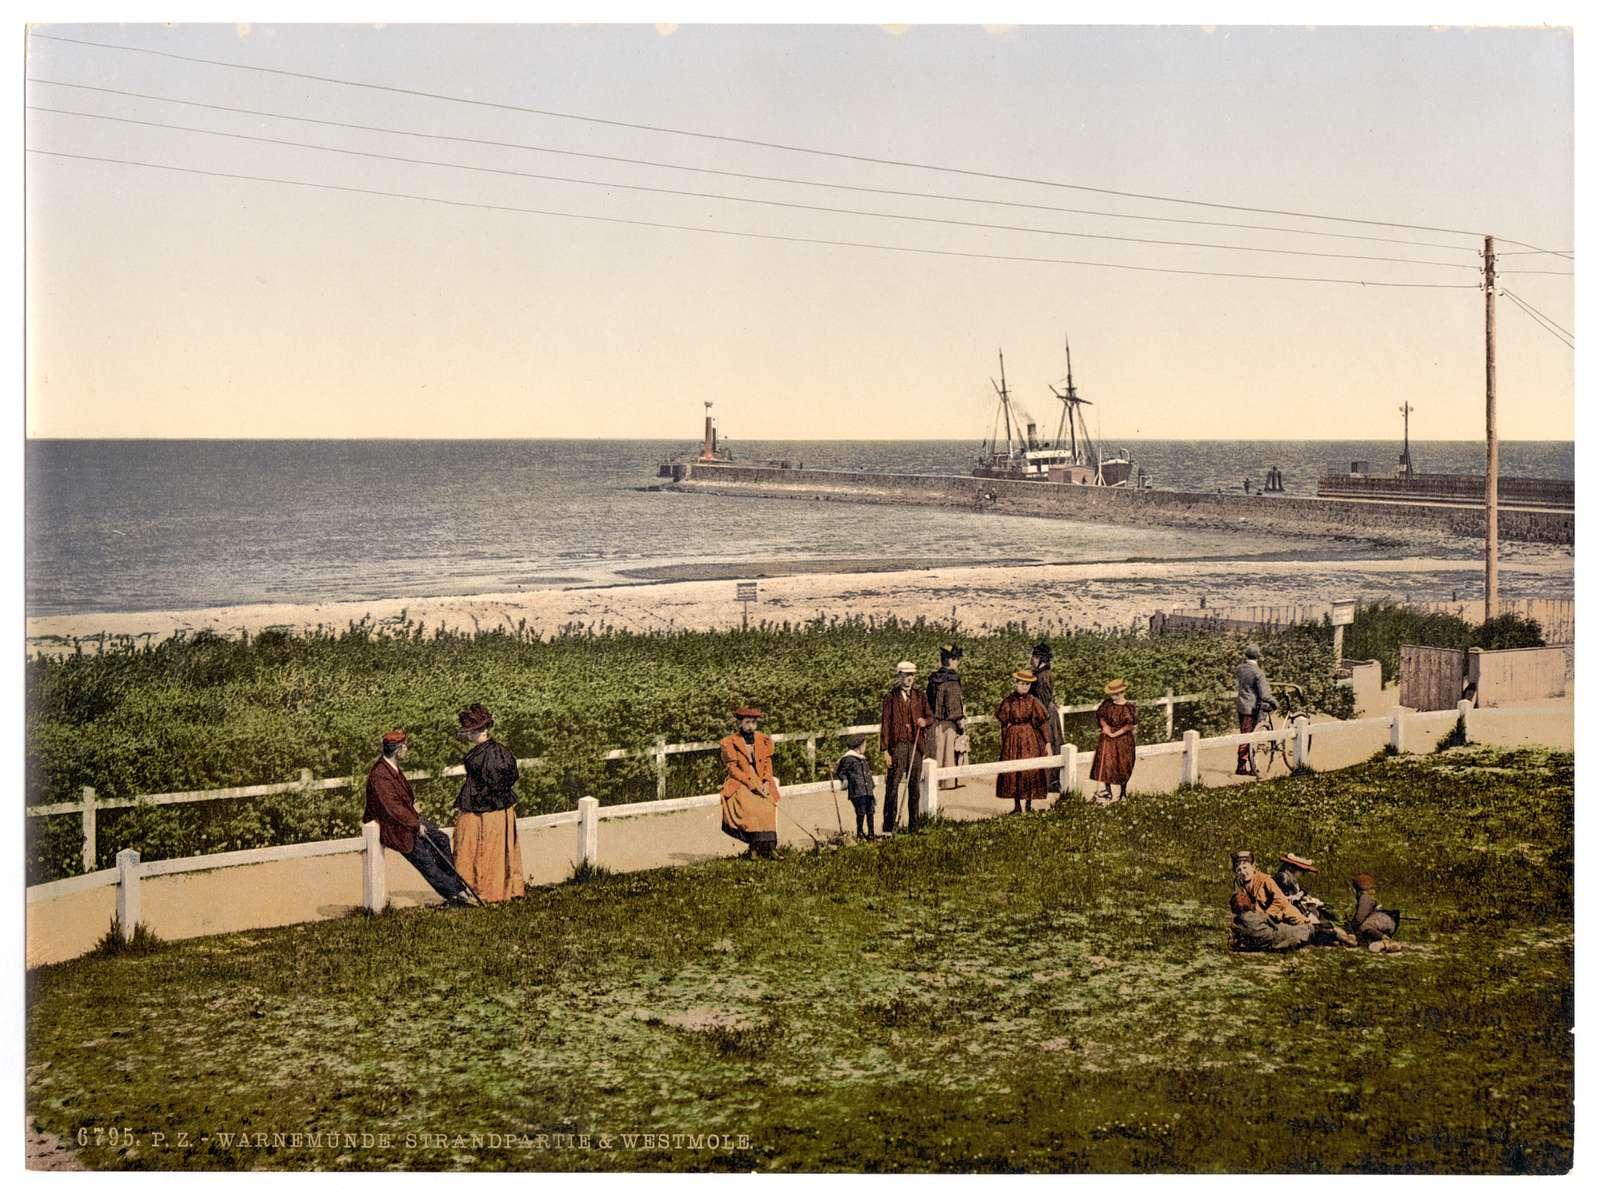 [The beach, Warnemü̈nde, Rostock, Mecklenburg-Schwerin, Germany]